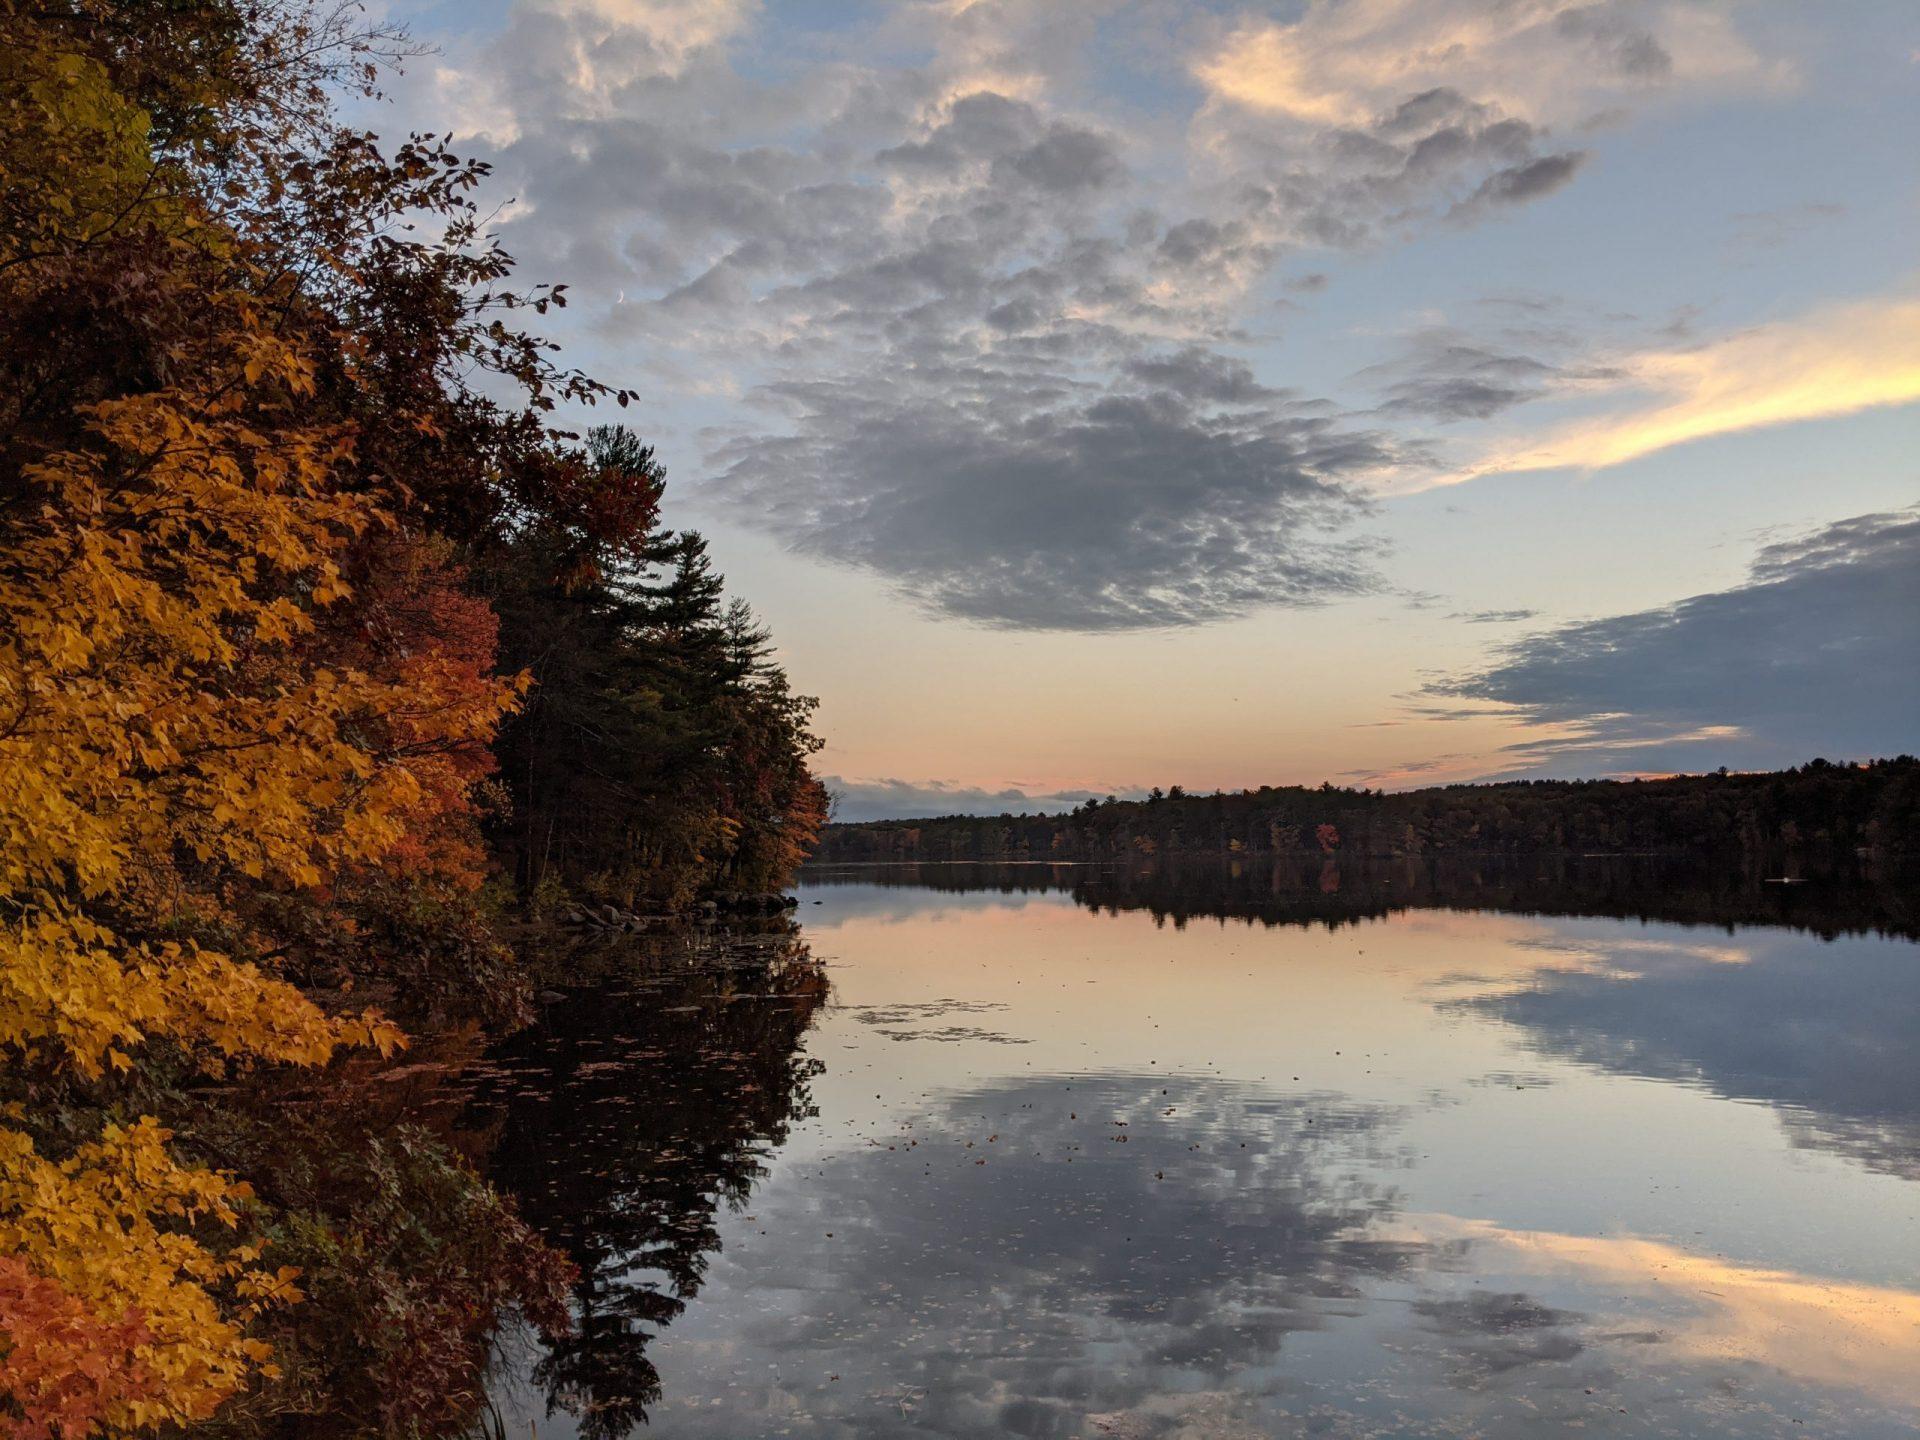 Oct 20, 2020 Ashland State Park